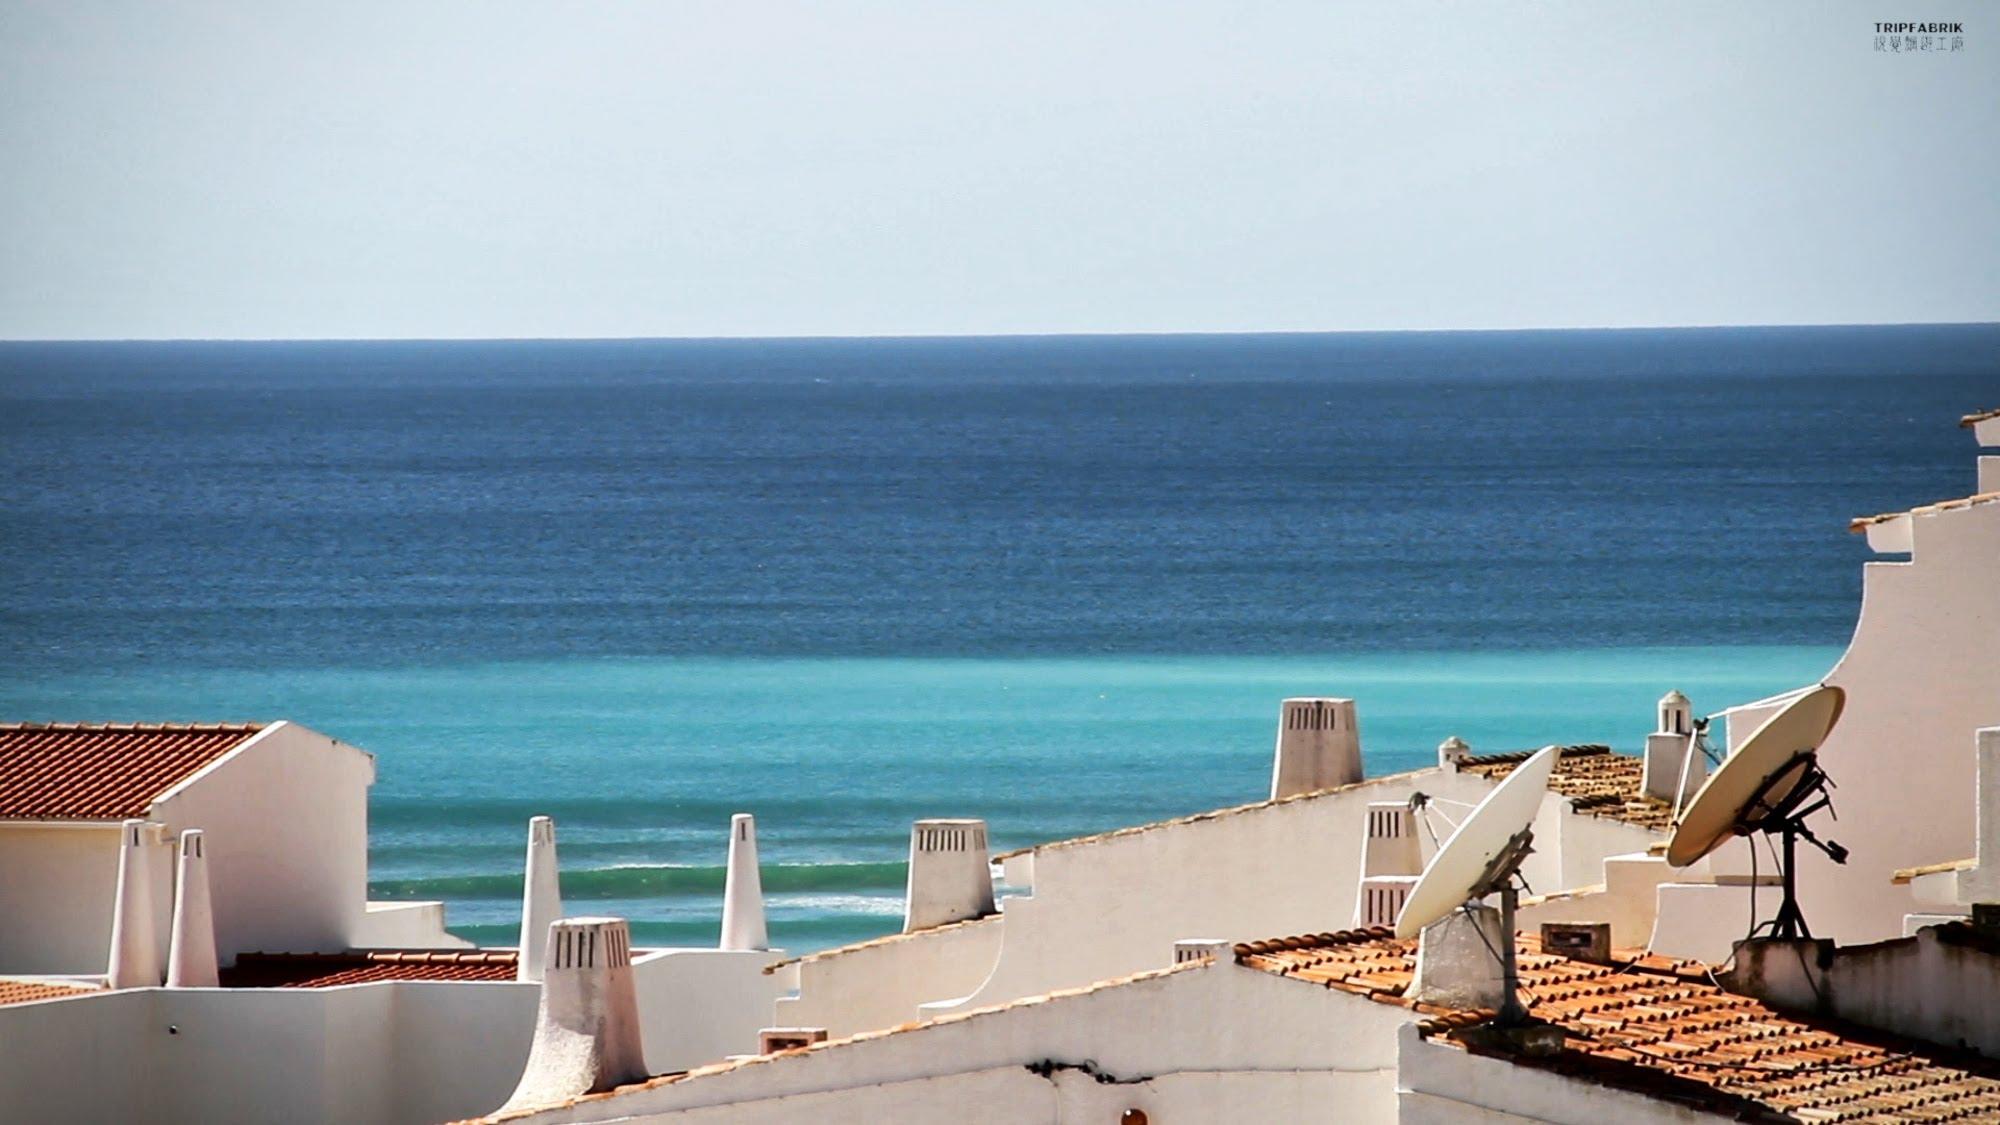 VIDEO: Odmorite oči uz snimku obale portugalske regije Algarve